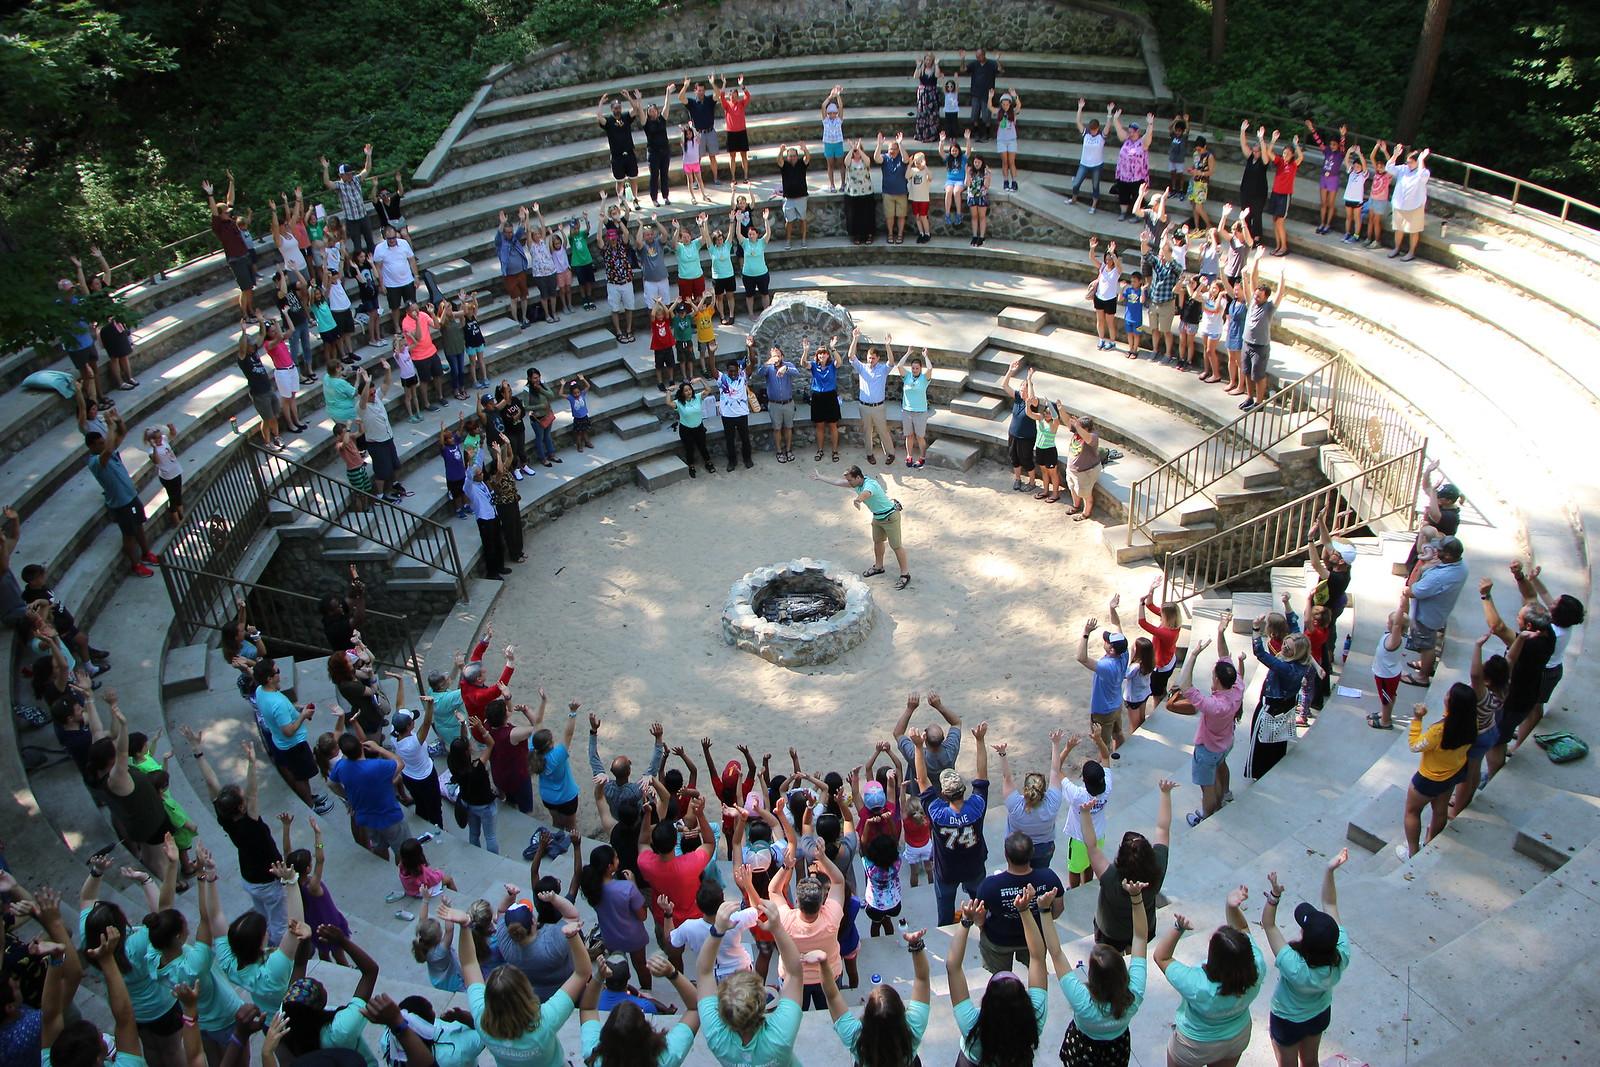 closing council, miniwanca, one week camp, summer camp, lake michigan, Michigan Summer camp